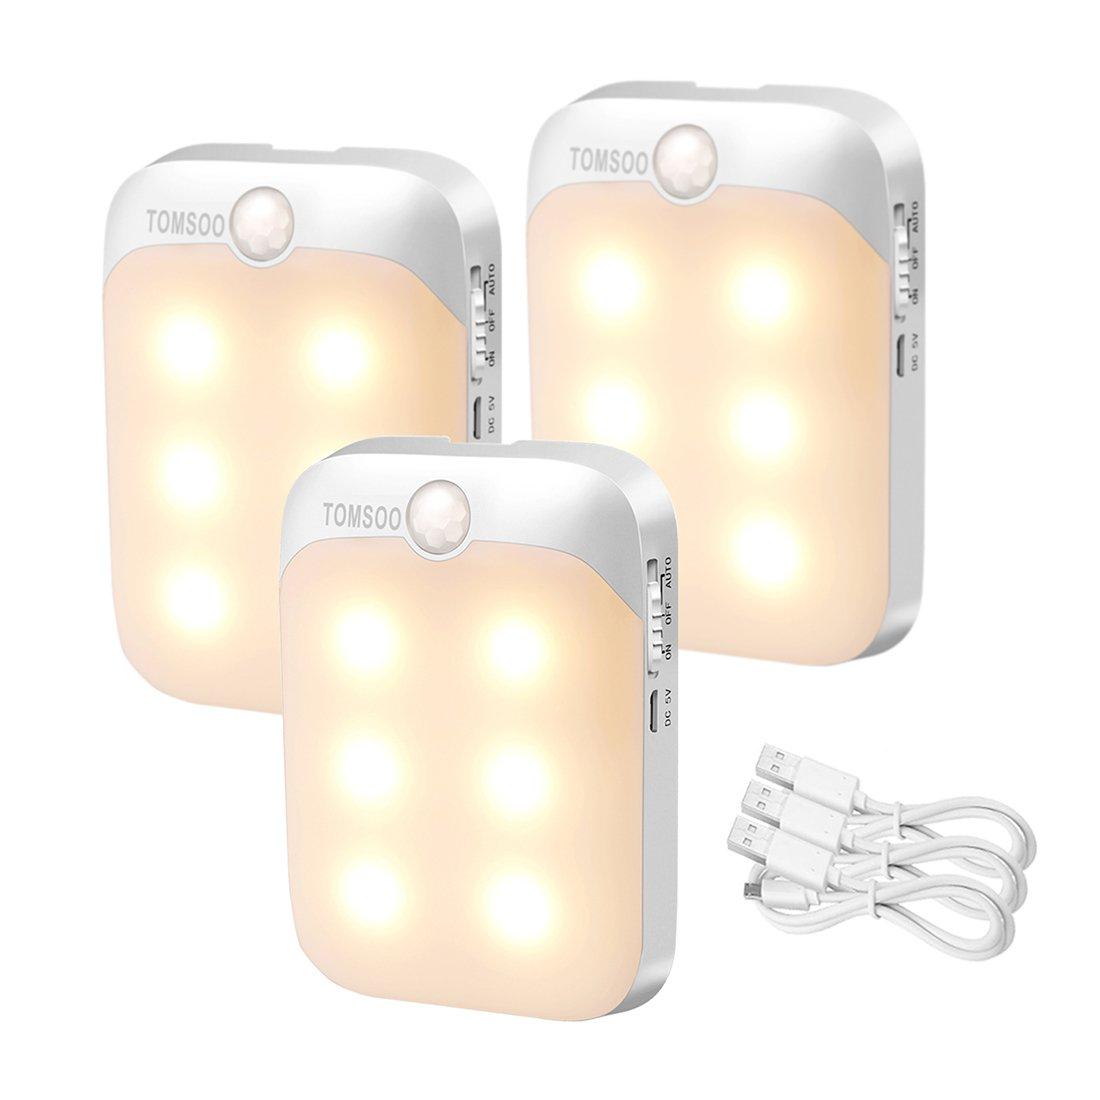 TOMSOO Rechargeable Motion Activated Sensor Light, Cordless Motion Sensing LED Night Light, 6-LED Wireless Porch Light, Closet Light, Emergency Light, Pack of 3 (Warm White)